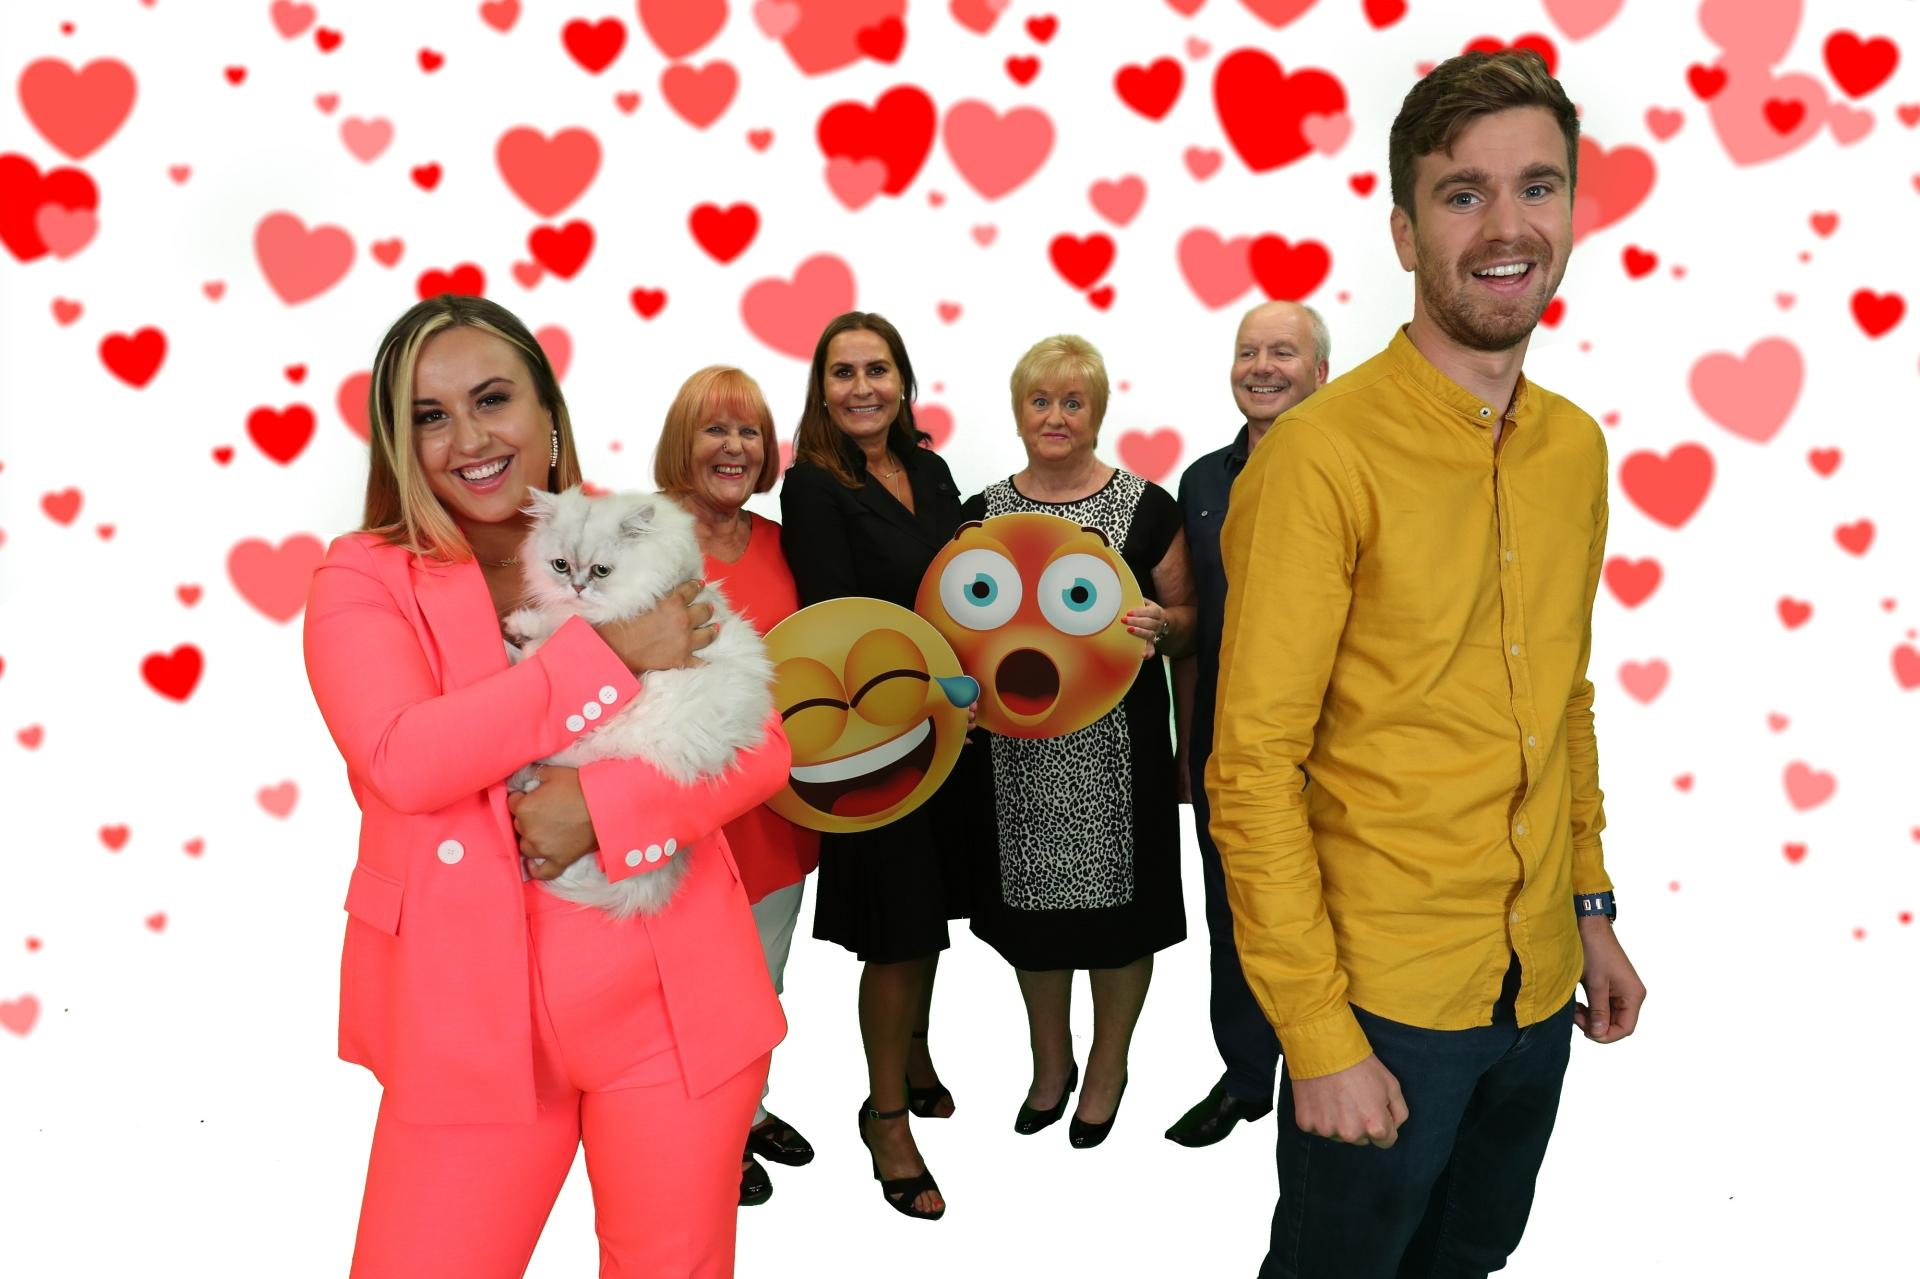 brighten-up.uk: Ireland Dating | Dating Site